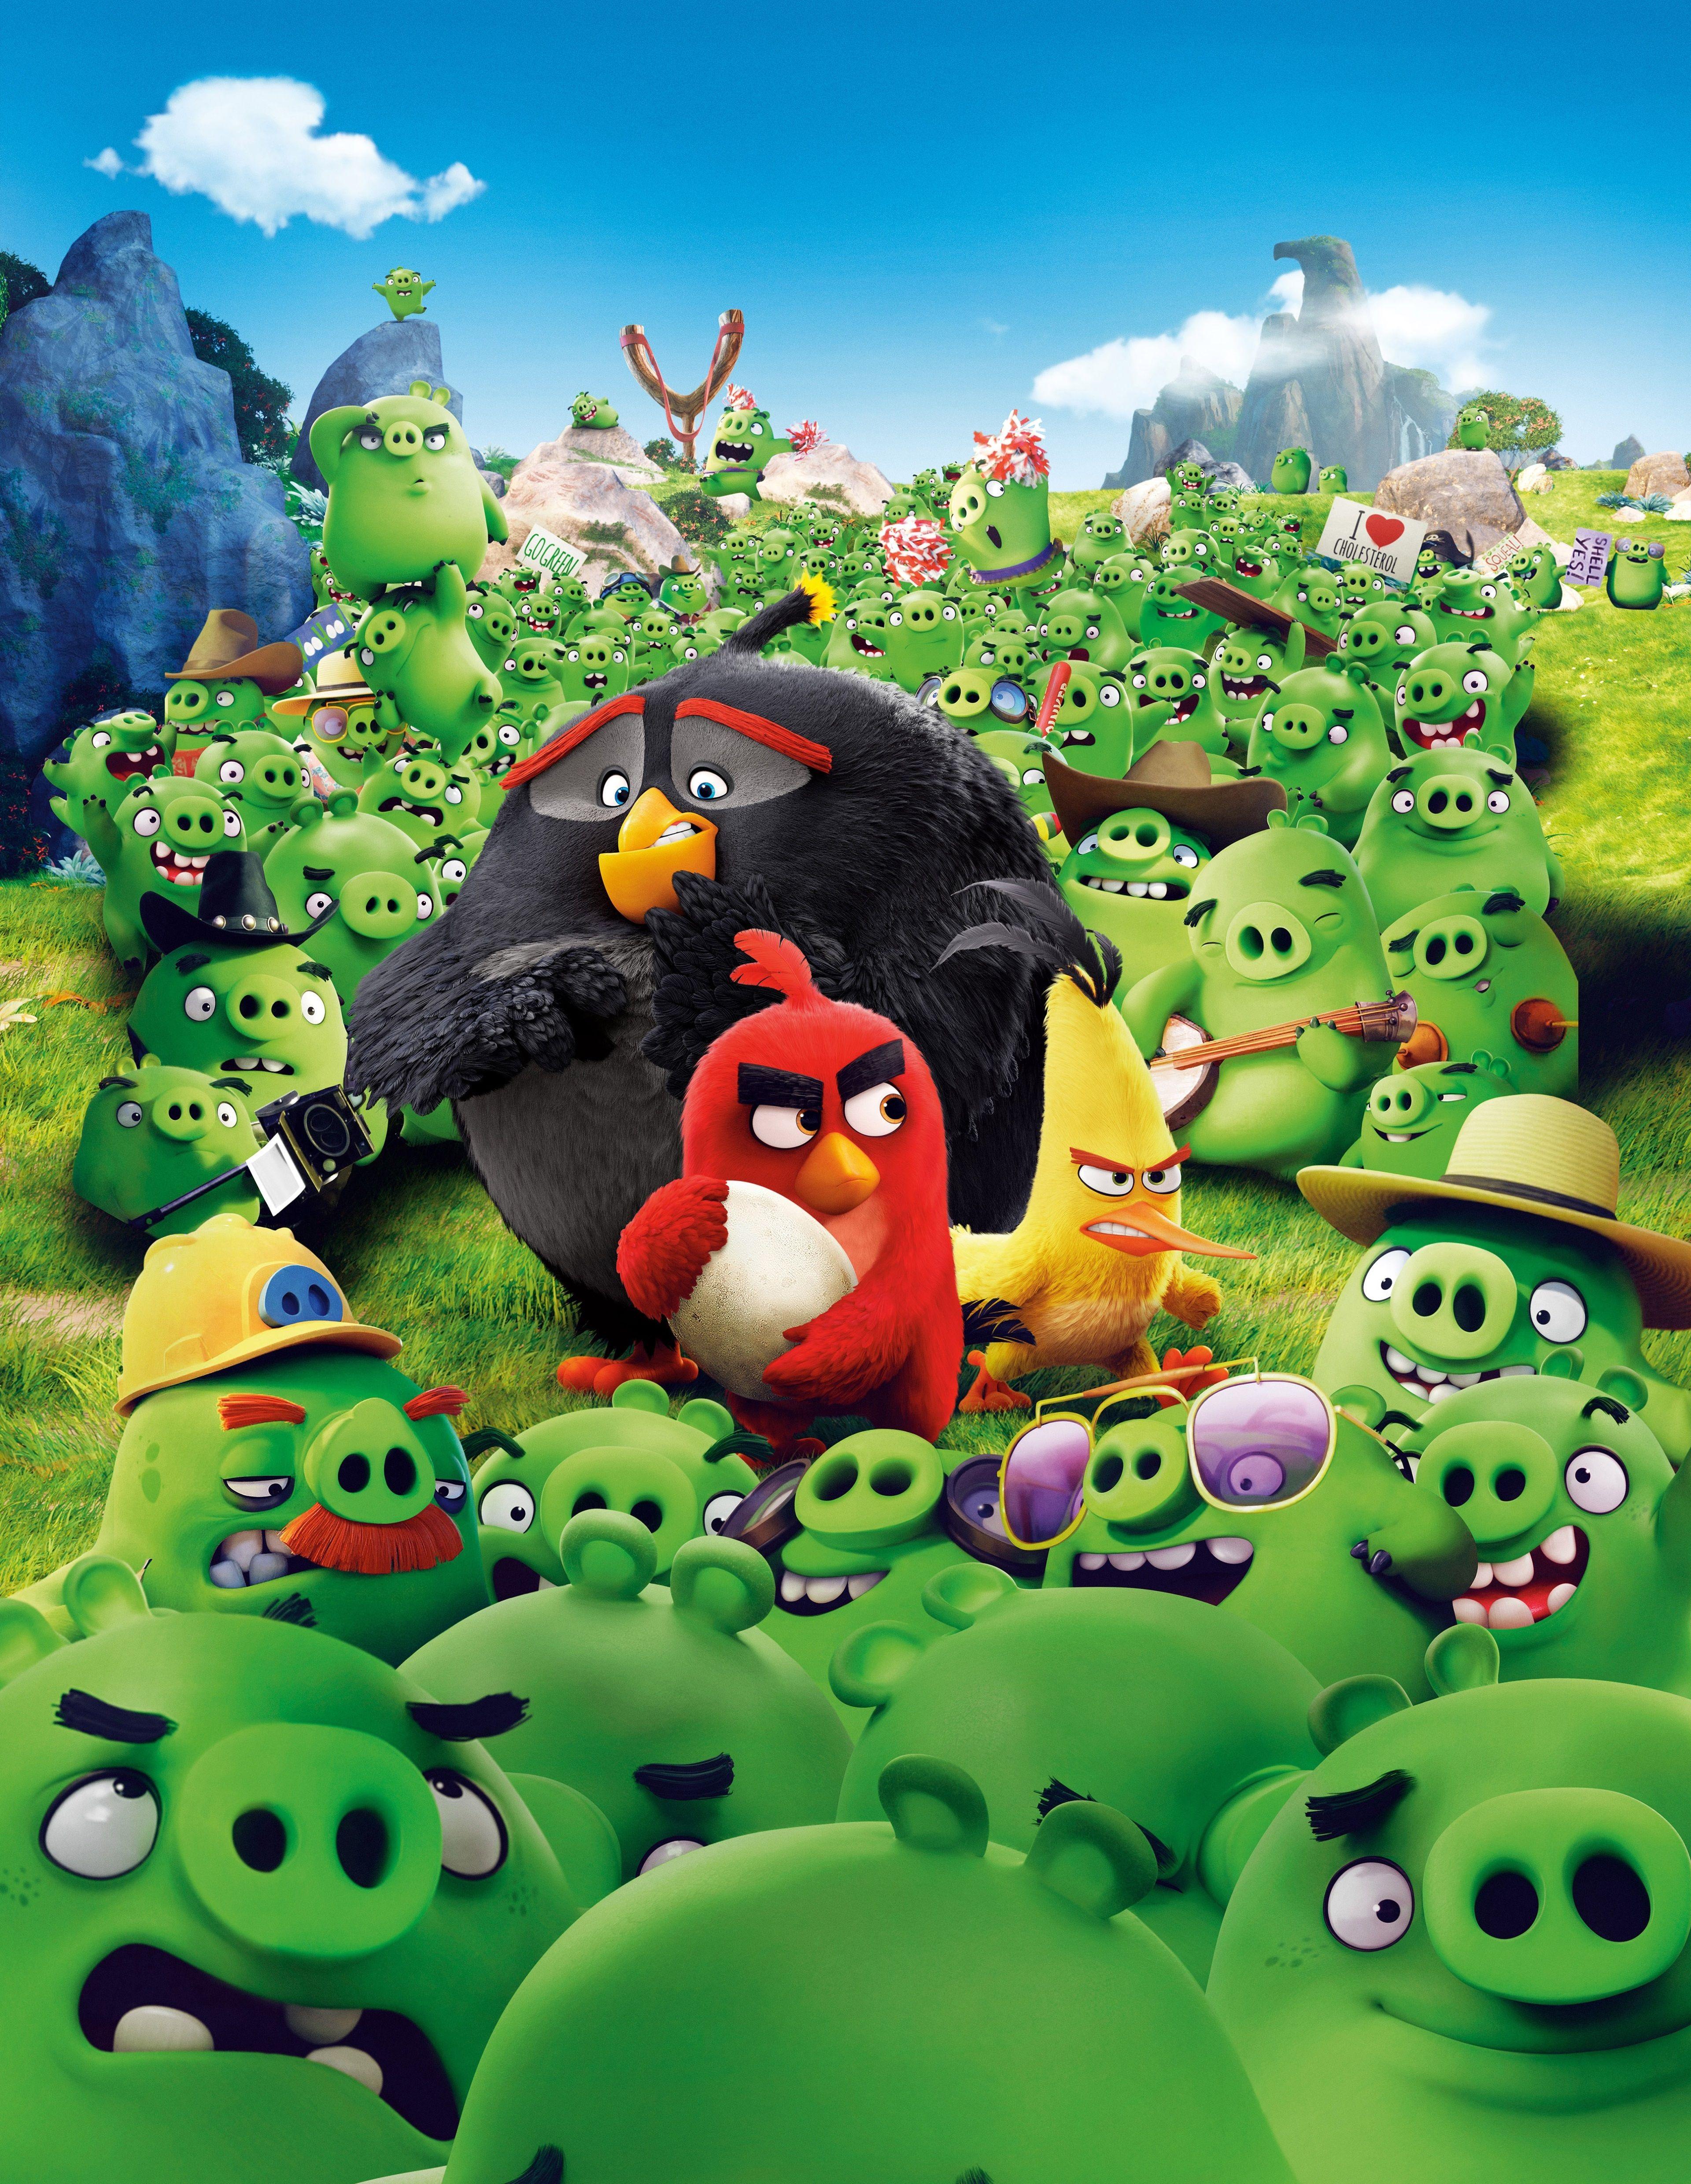 3840x4959 Angry Birds 4k Hd Wallpaper Pic Angry Birds Angry Birds Movie Cartoon Birds